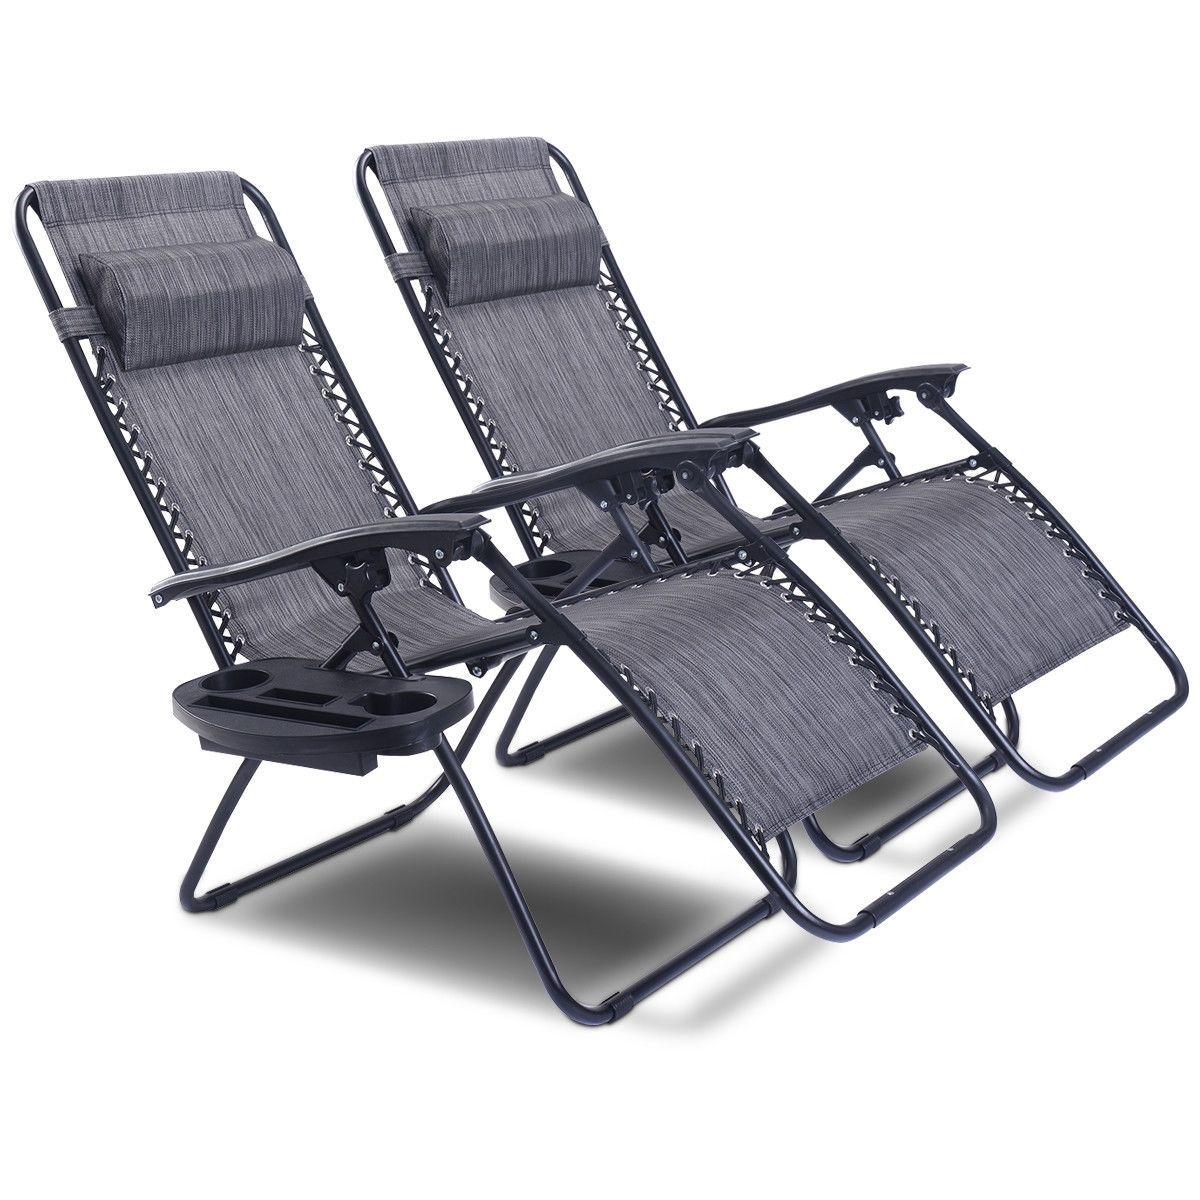 2 Pcs Folding Lounge Chair With Zero Gravity Gray Lawn Chairs